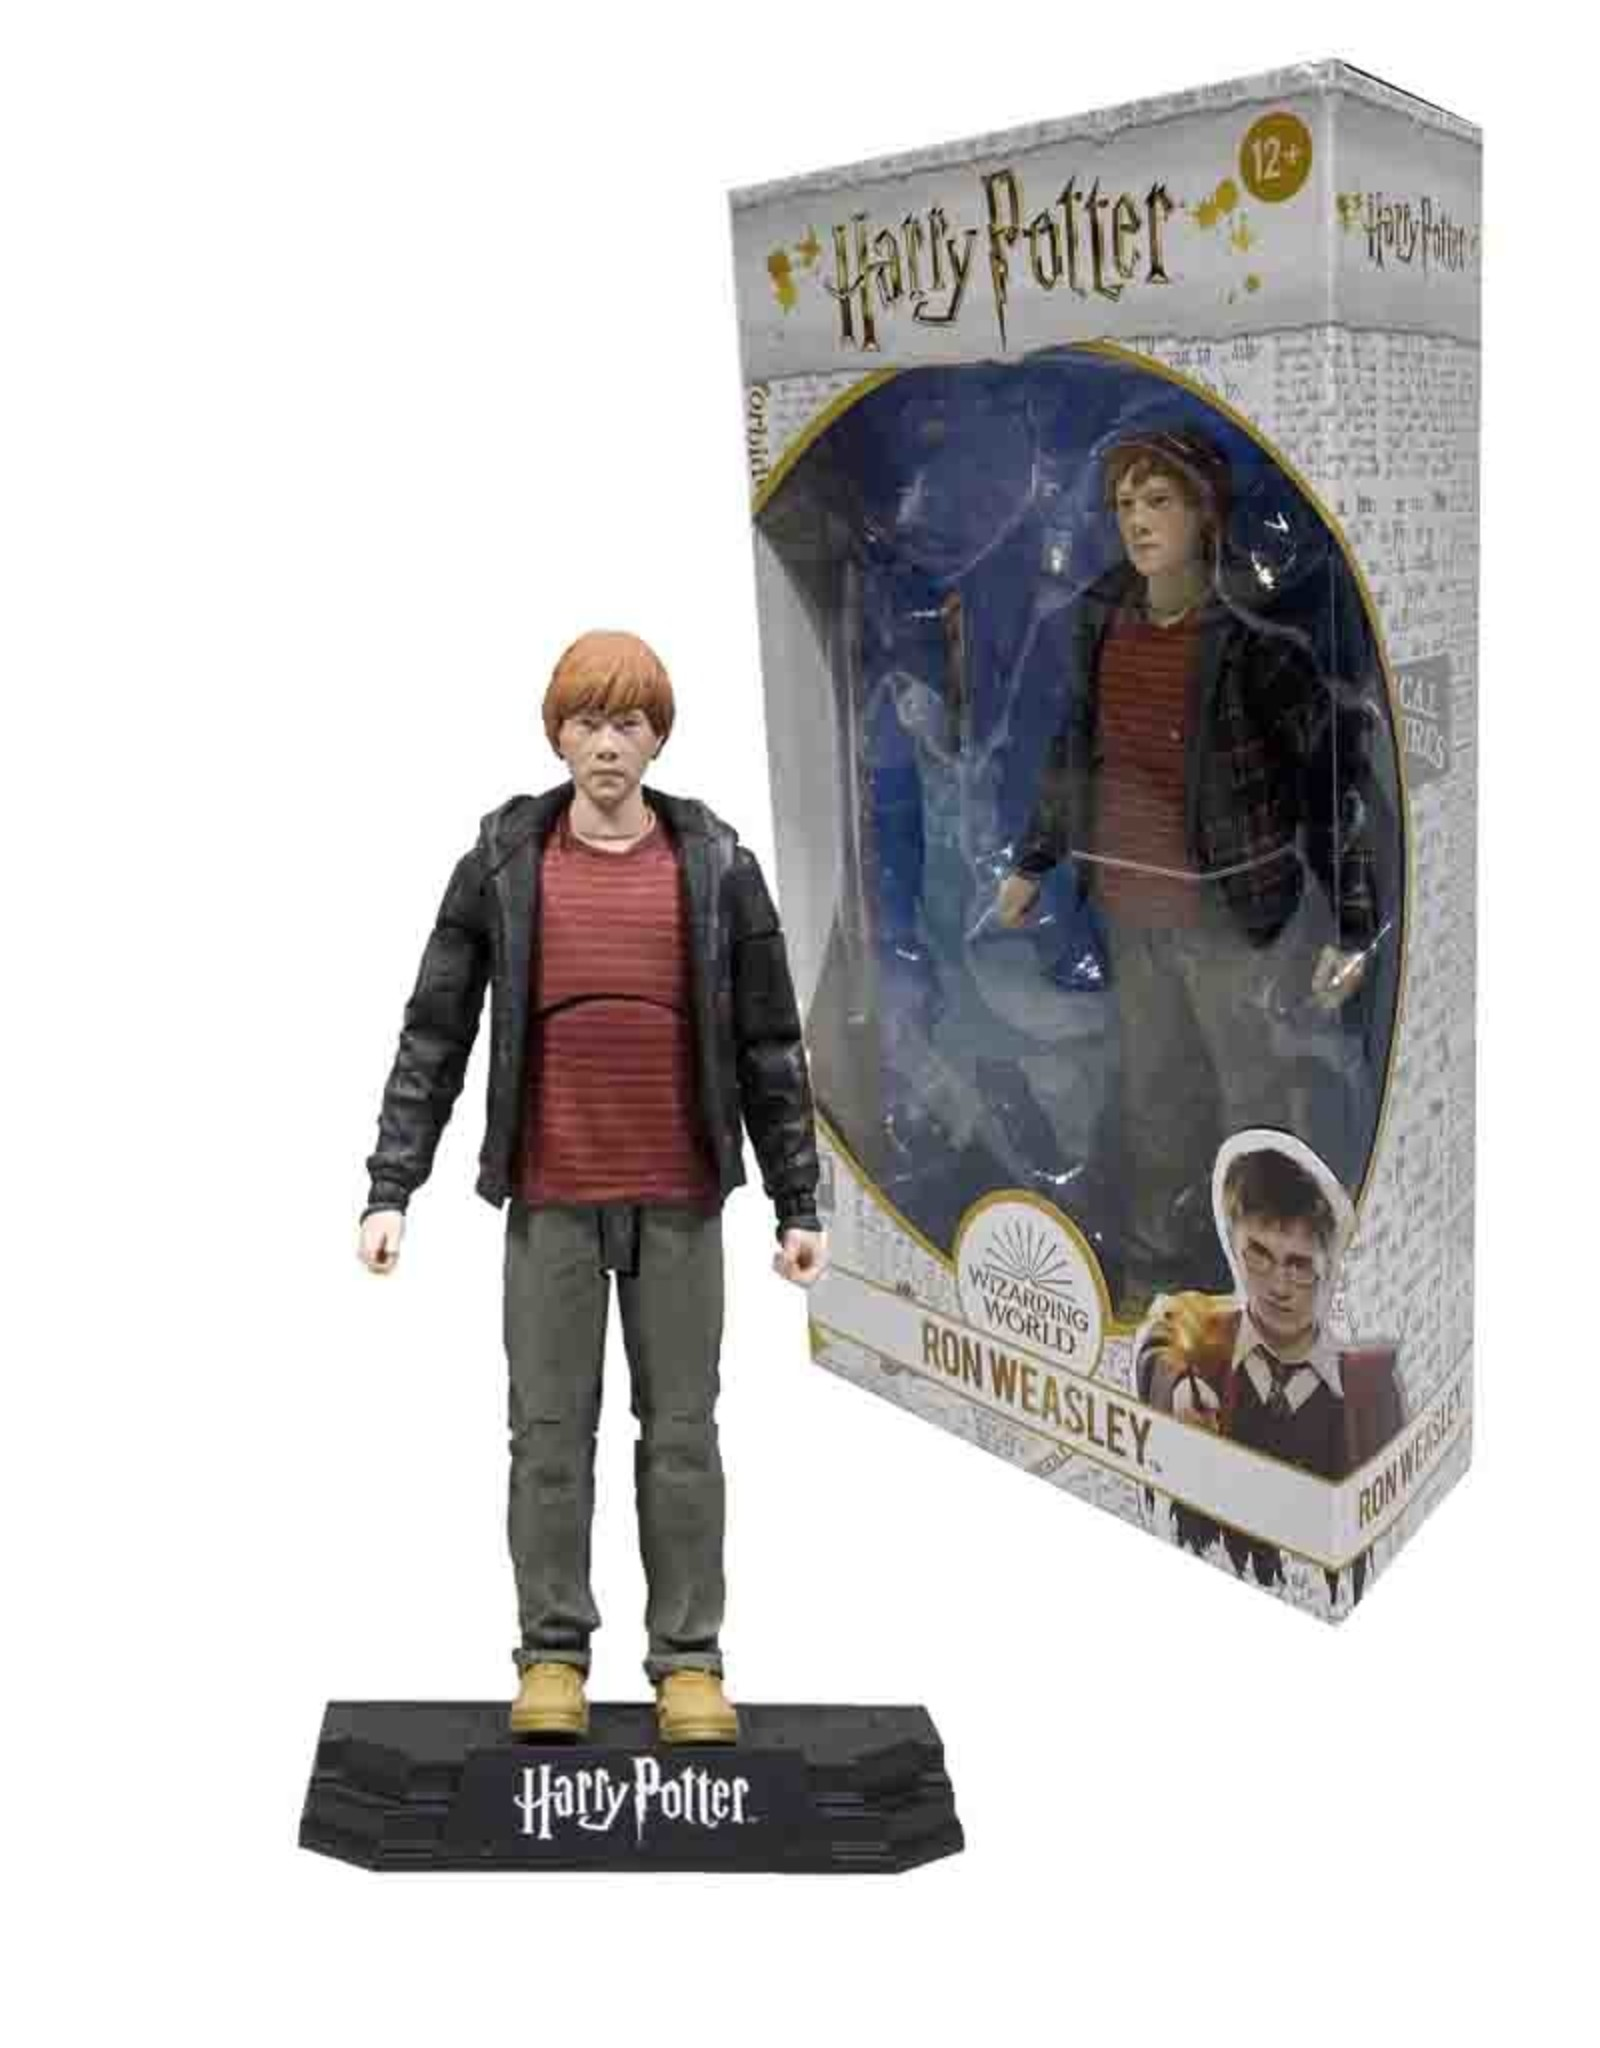 Harry Potter Harry Potter ( McFarlane Figurine ) Ron Weasley